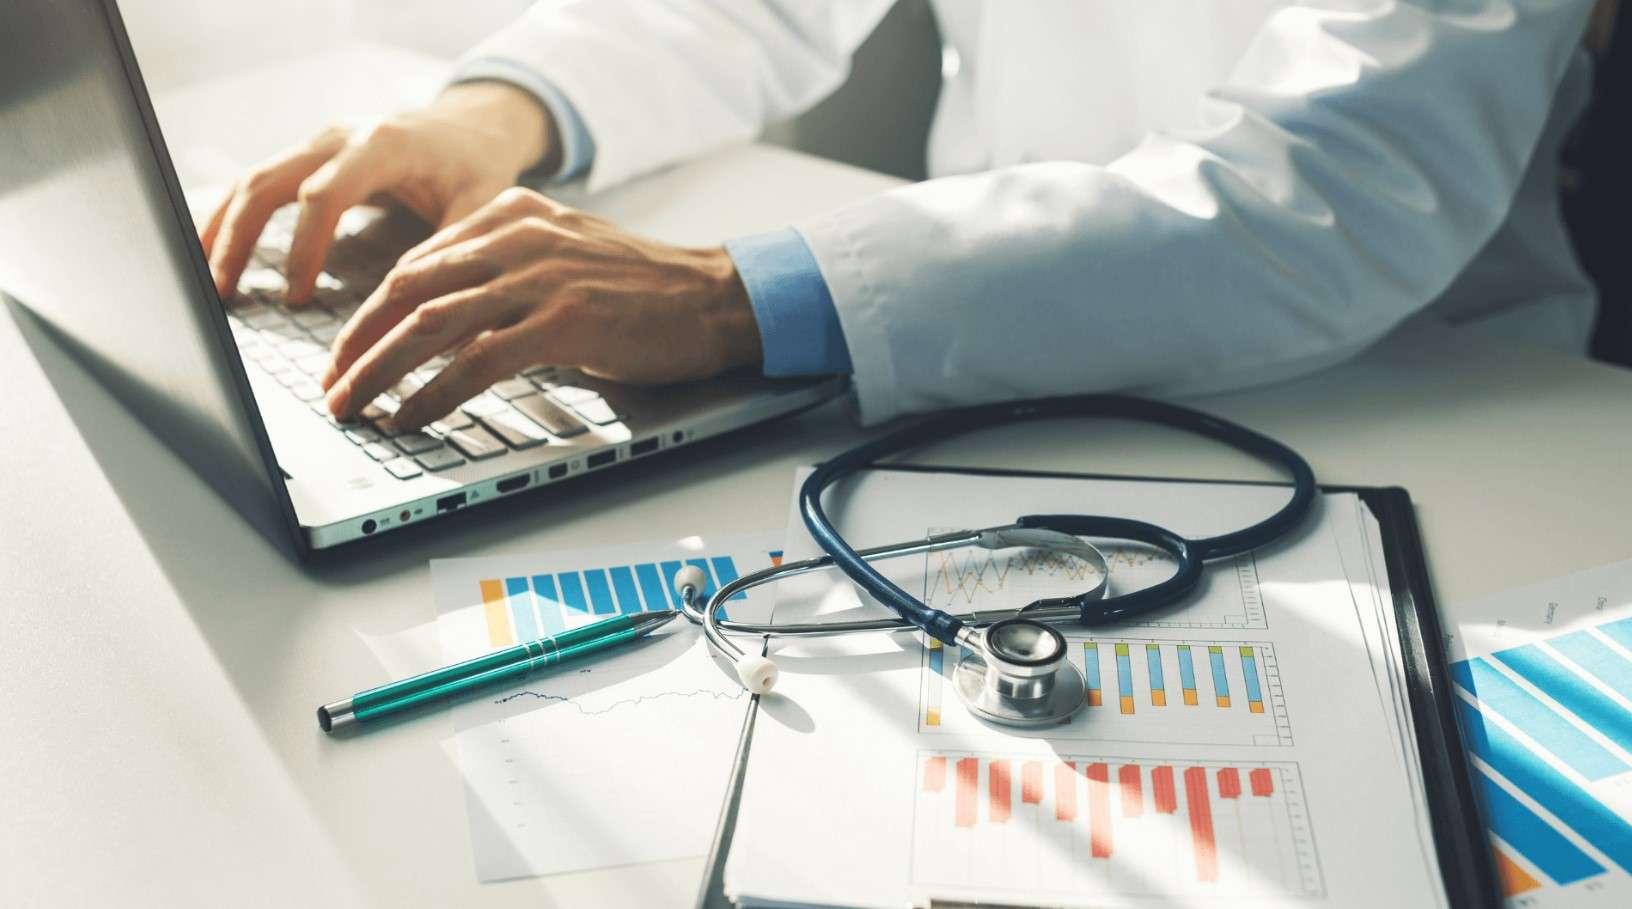 Medikal Çeviriyi Doktorlar mı Yapmalı?